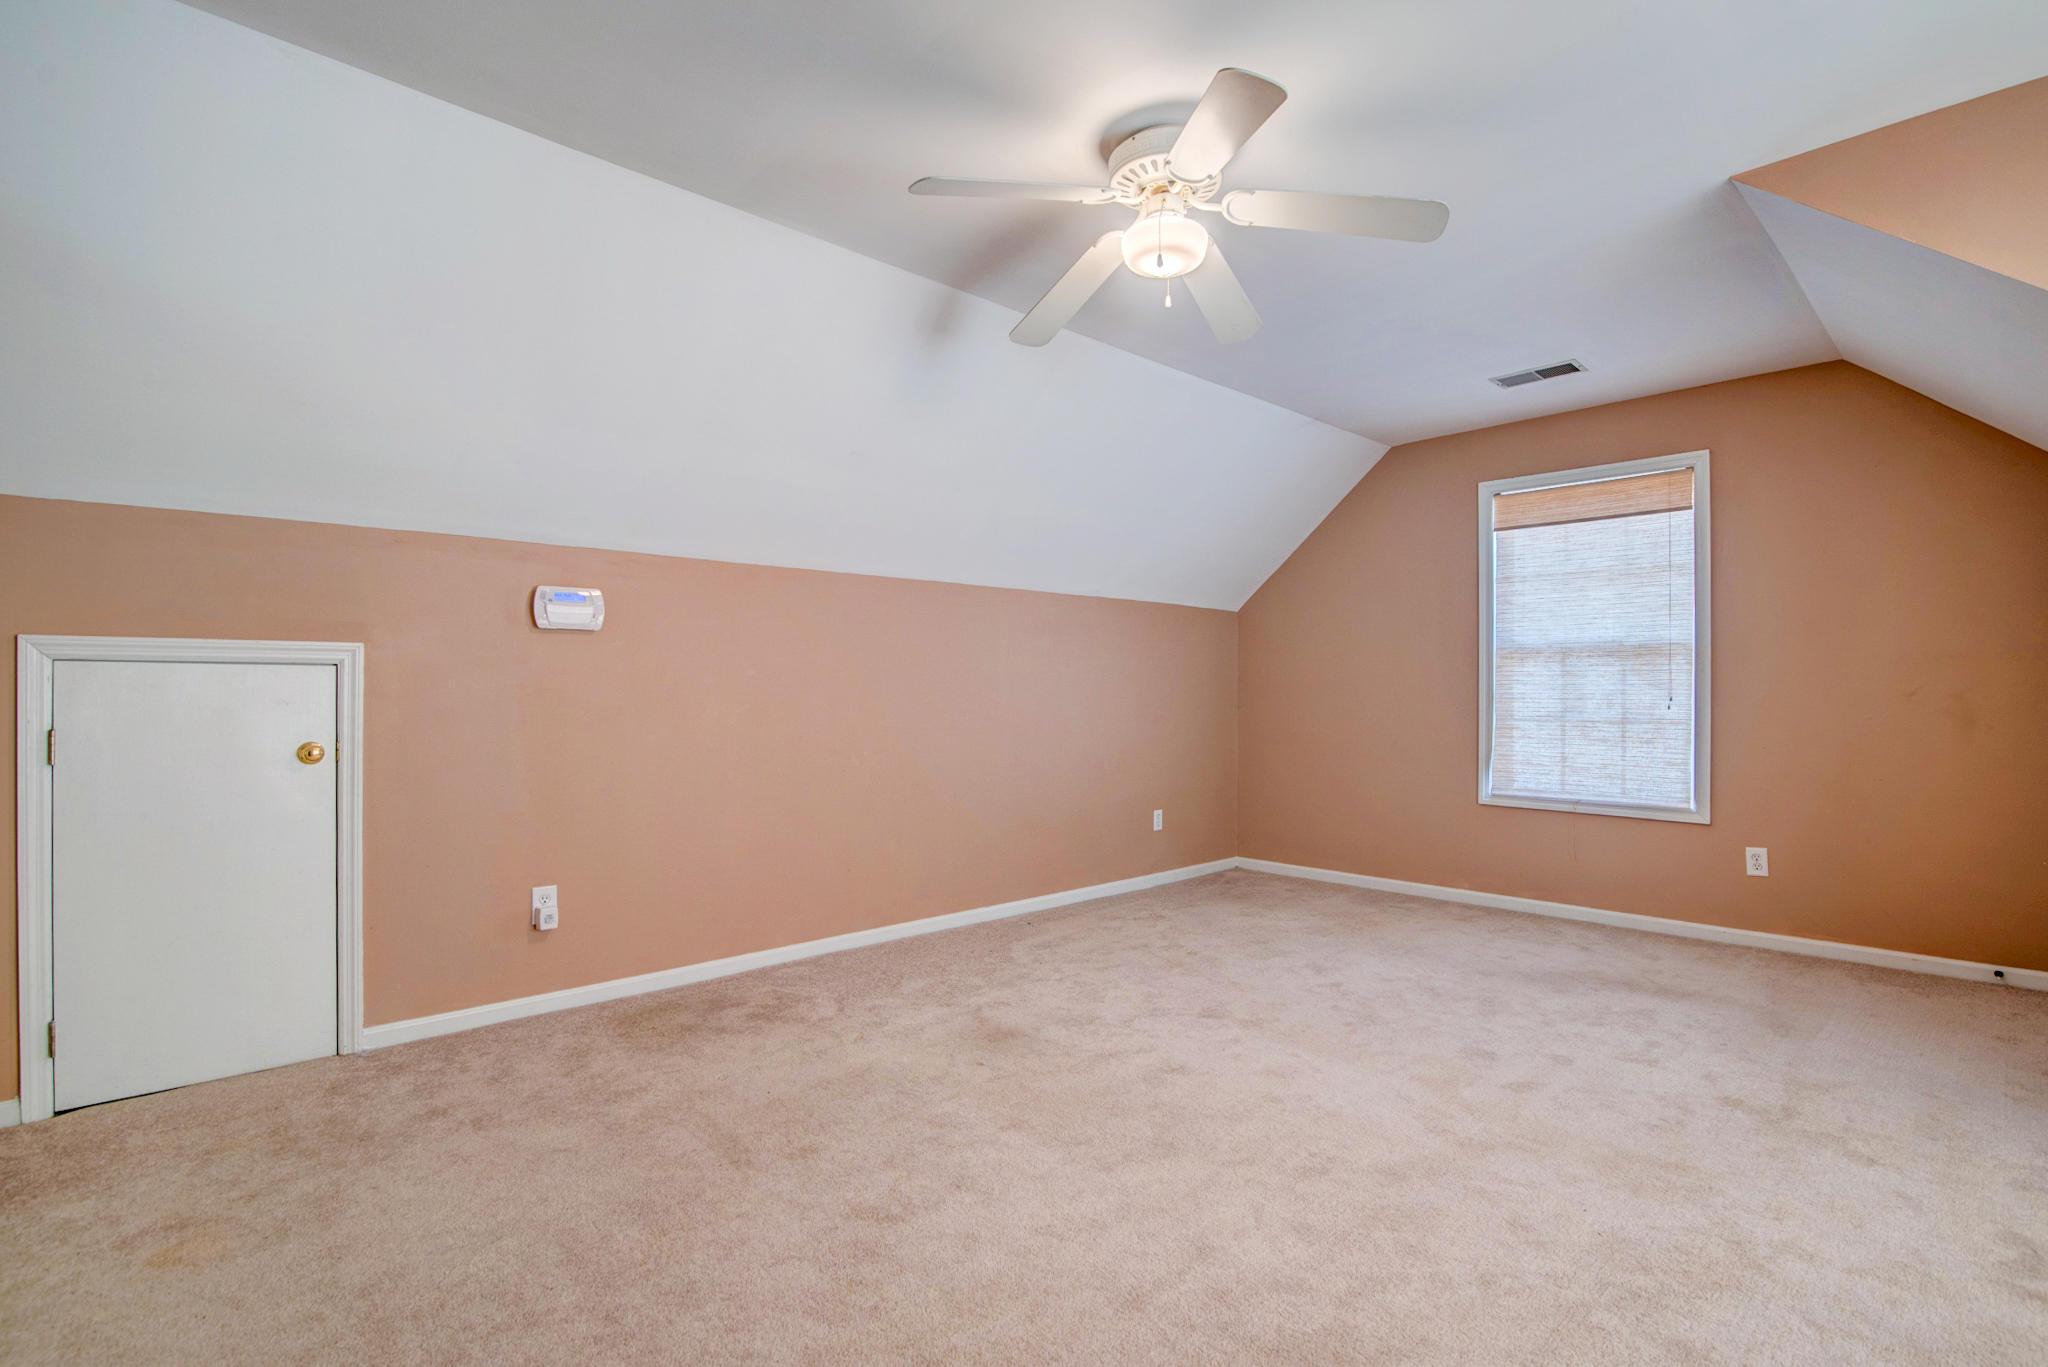 Planters Pointe Homes For Sale - 3382 Lindner, Mount Pleasant, SC - 11